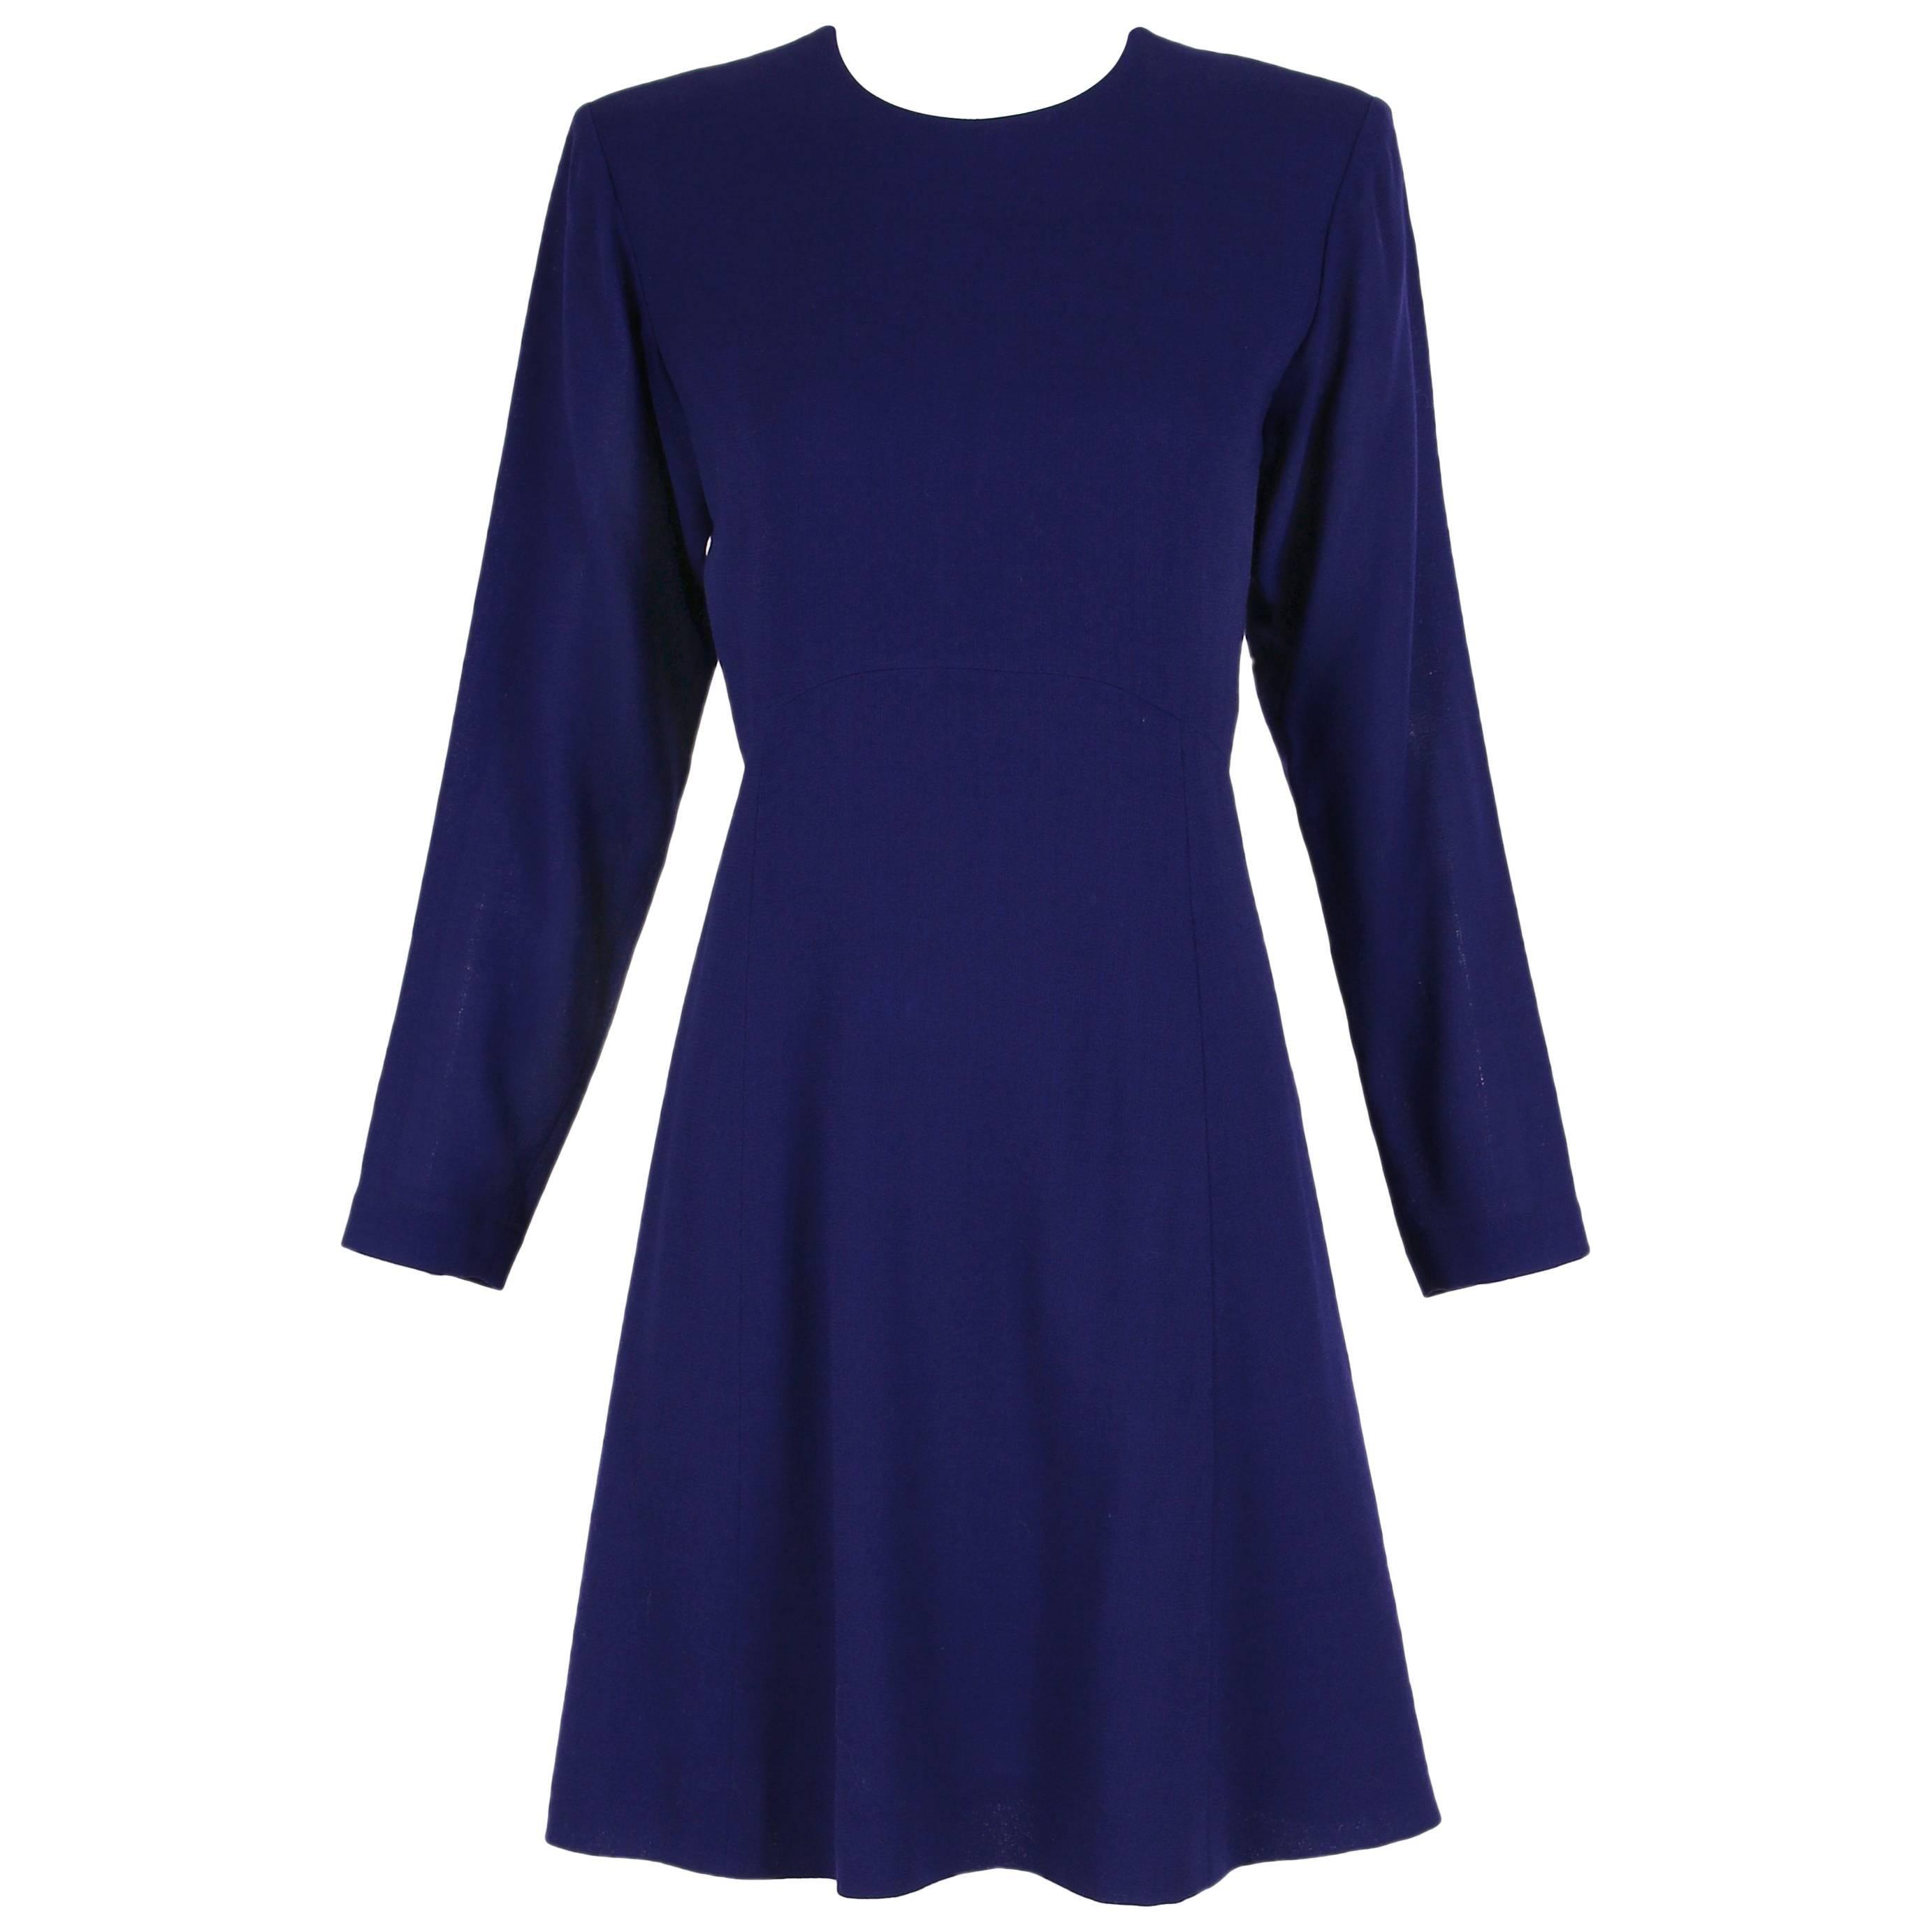 Yves Saint Laurent YSL Purple Knee-Length Day Dress